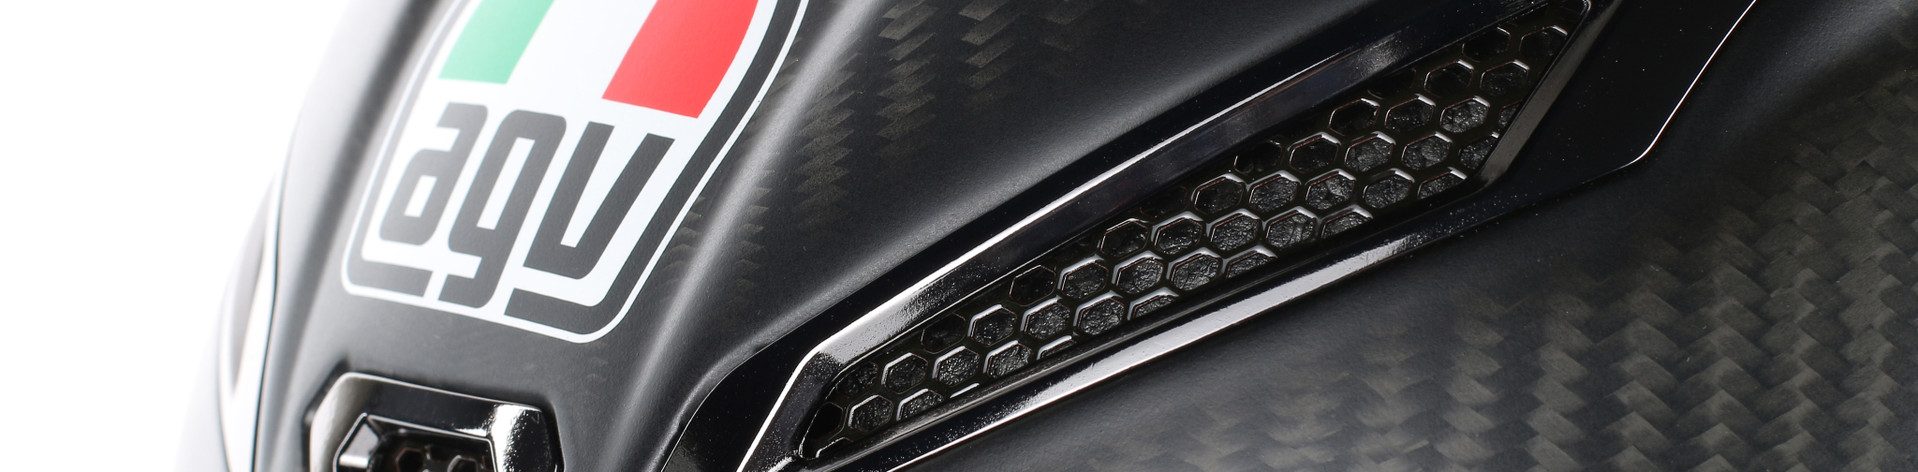 0ff0b60ca4a Cascos Moto AGV - En venta en Dainese (Tienda Oficial)